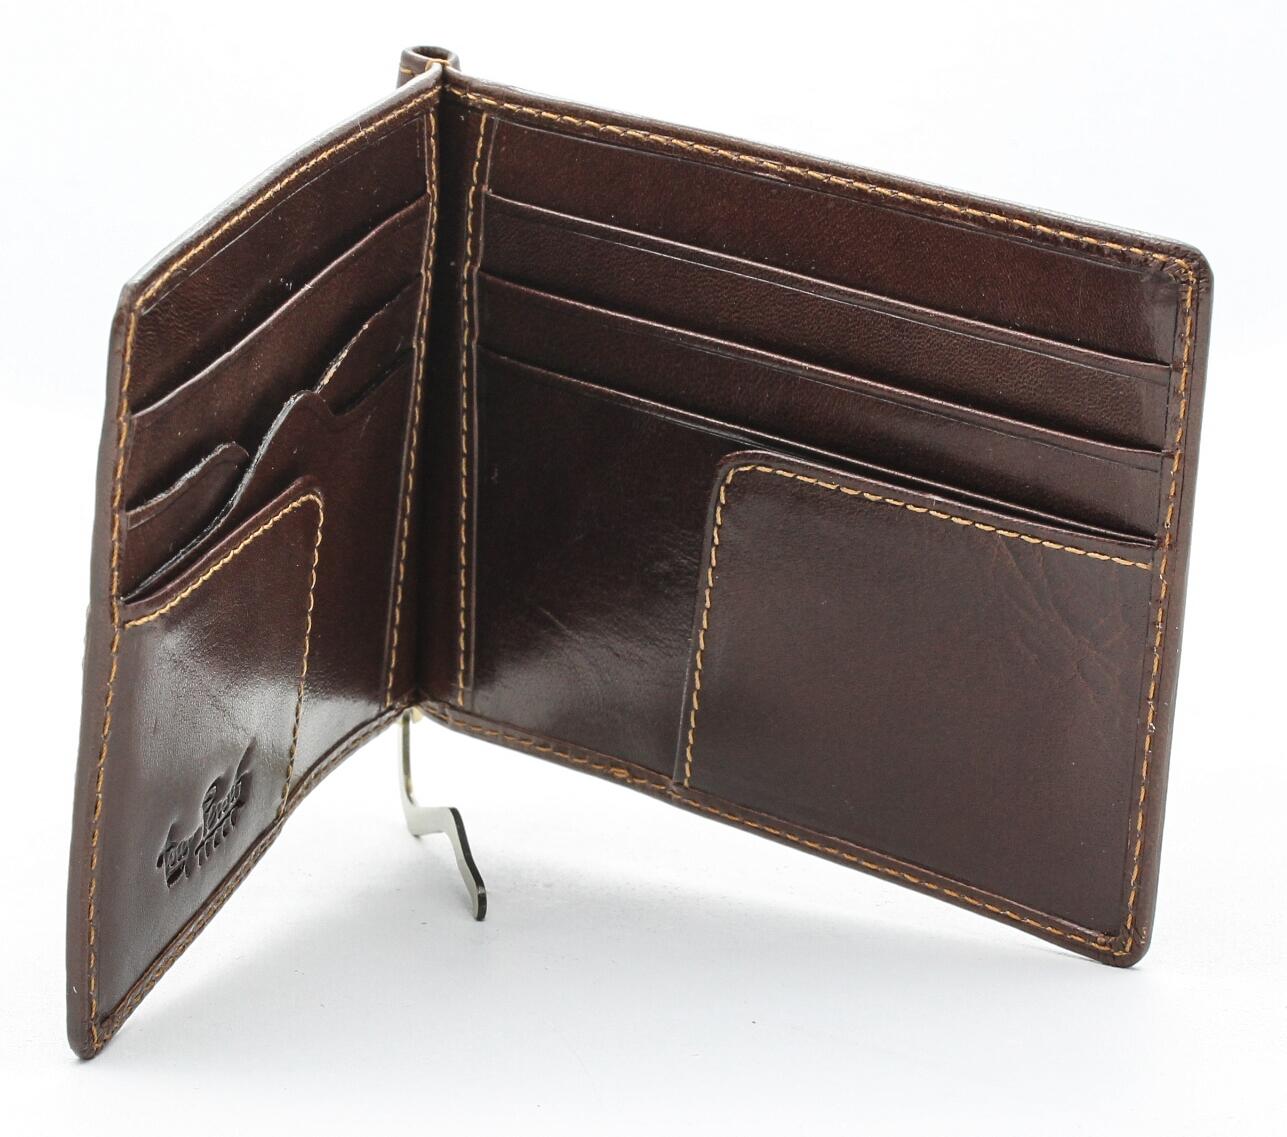 Tony-Perotti-Italian-Leather-Executive-Credit-Card-Money-Clip-Wallet thumbnail 8